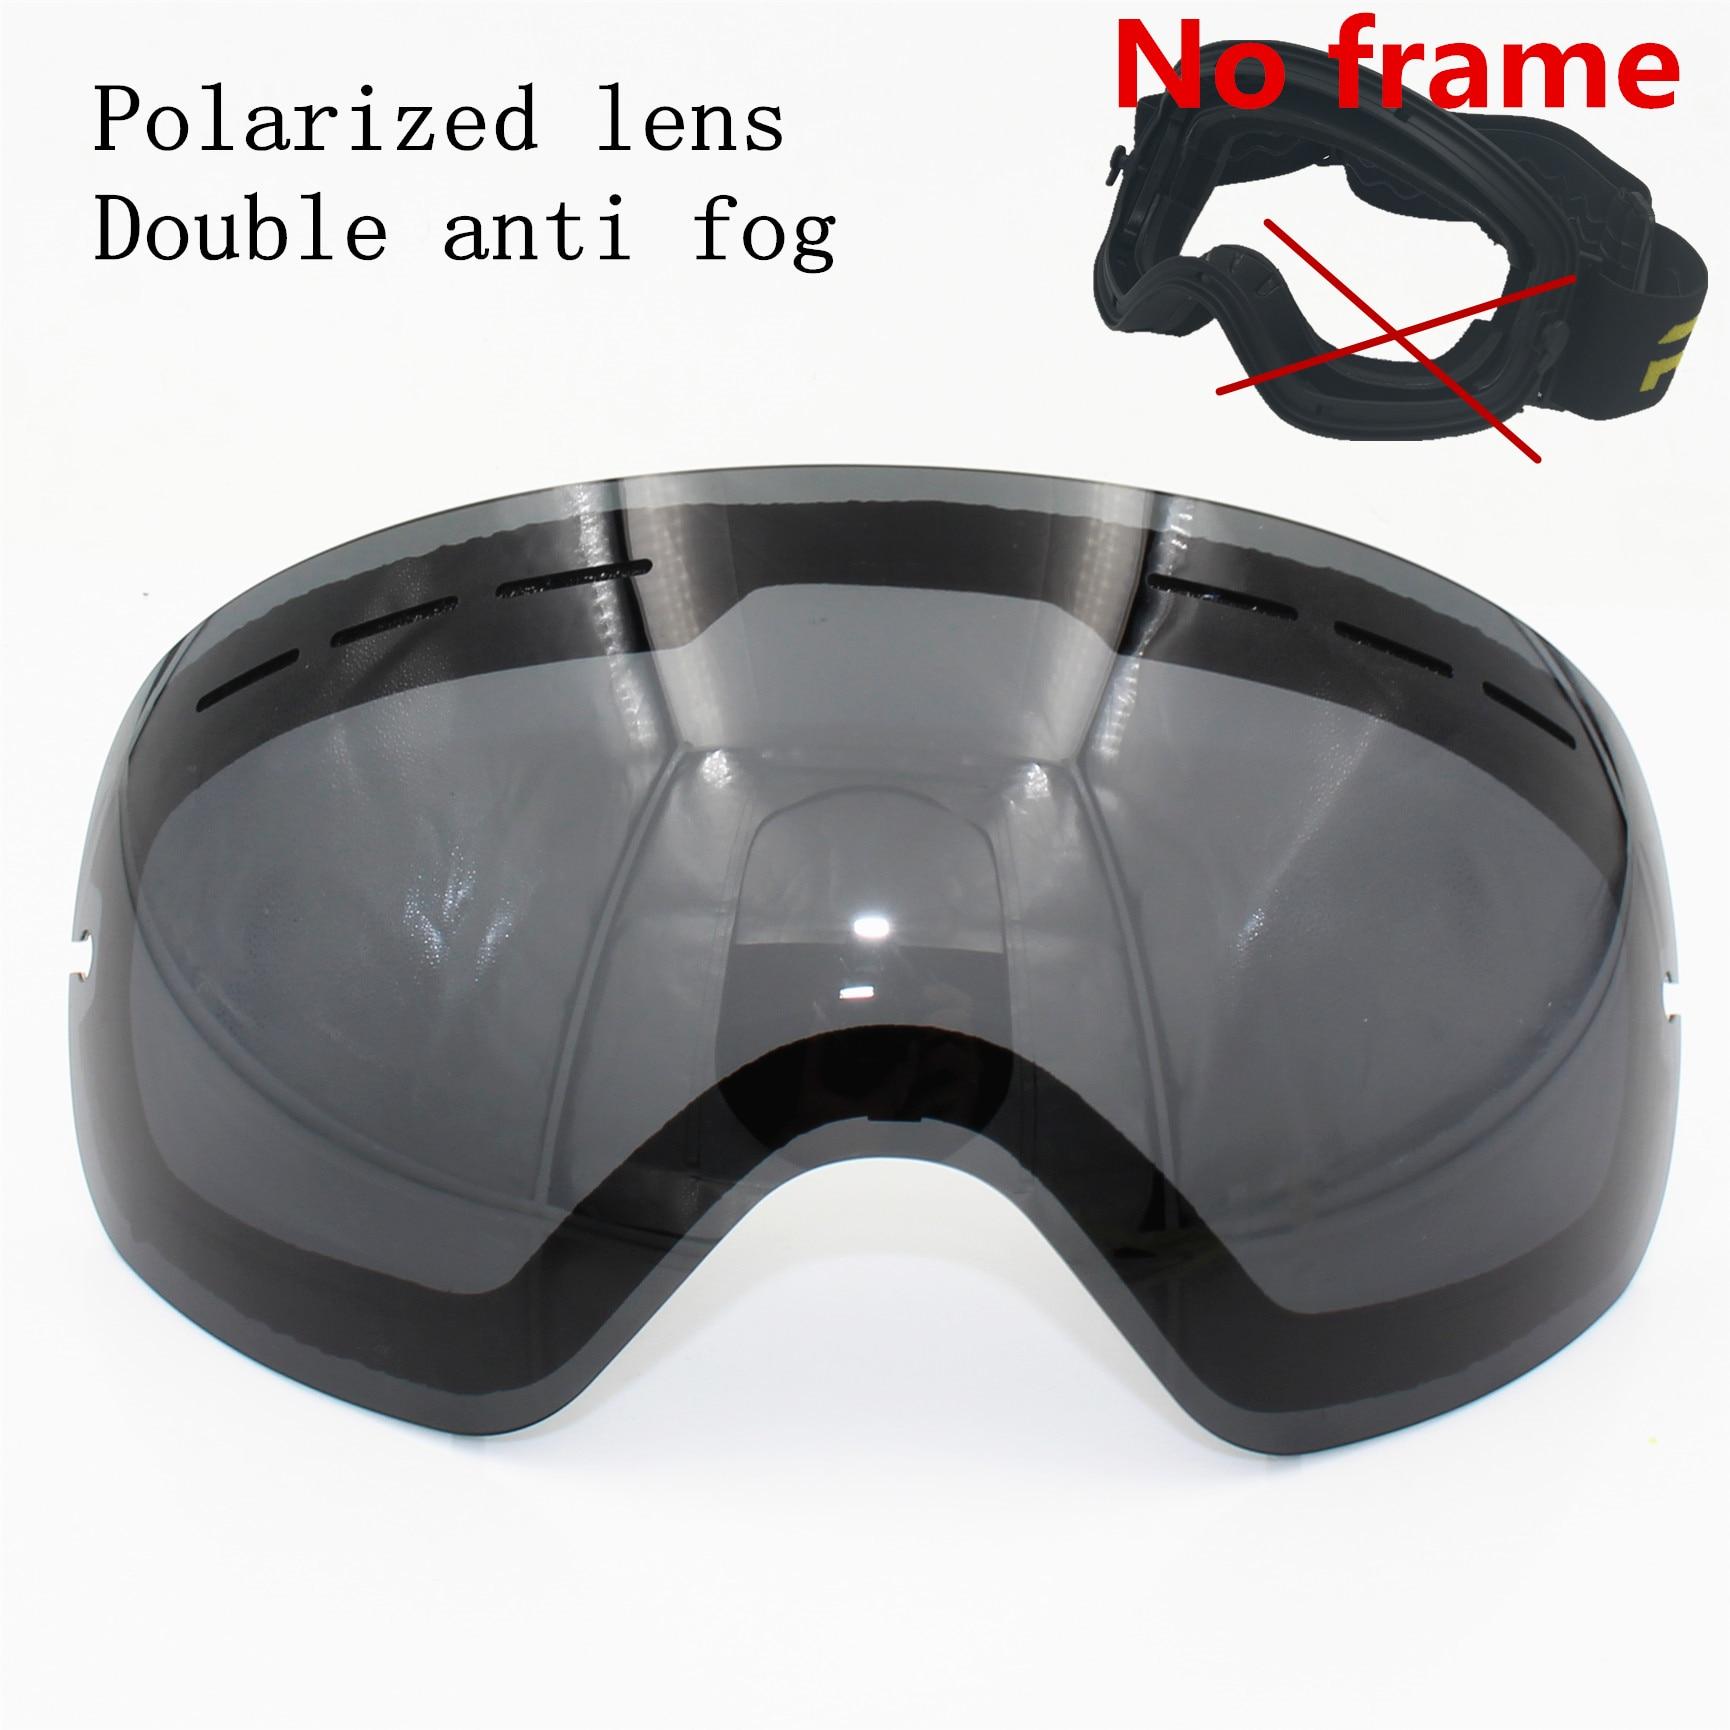 Polarized (No frame)